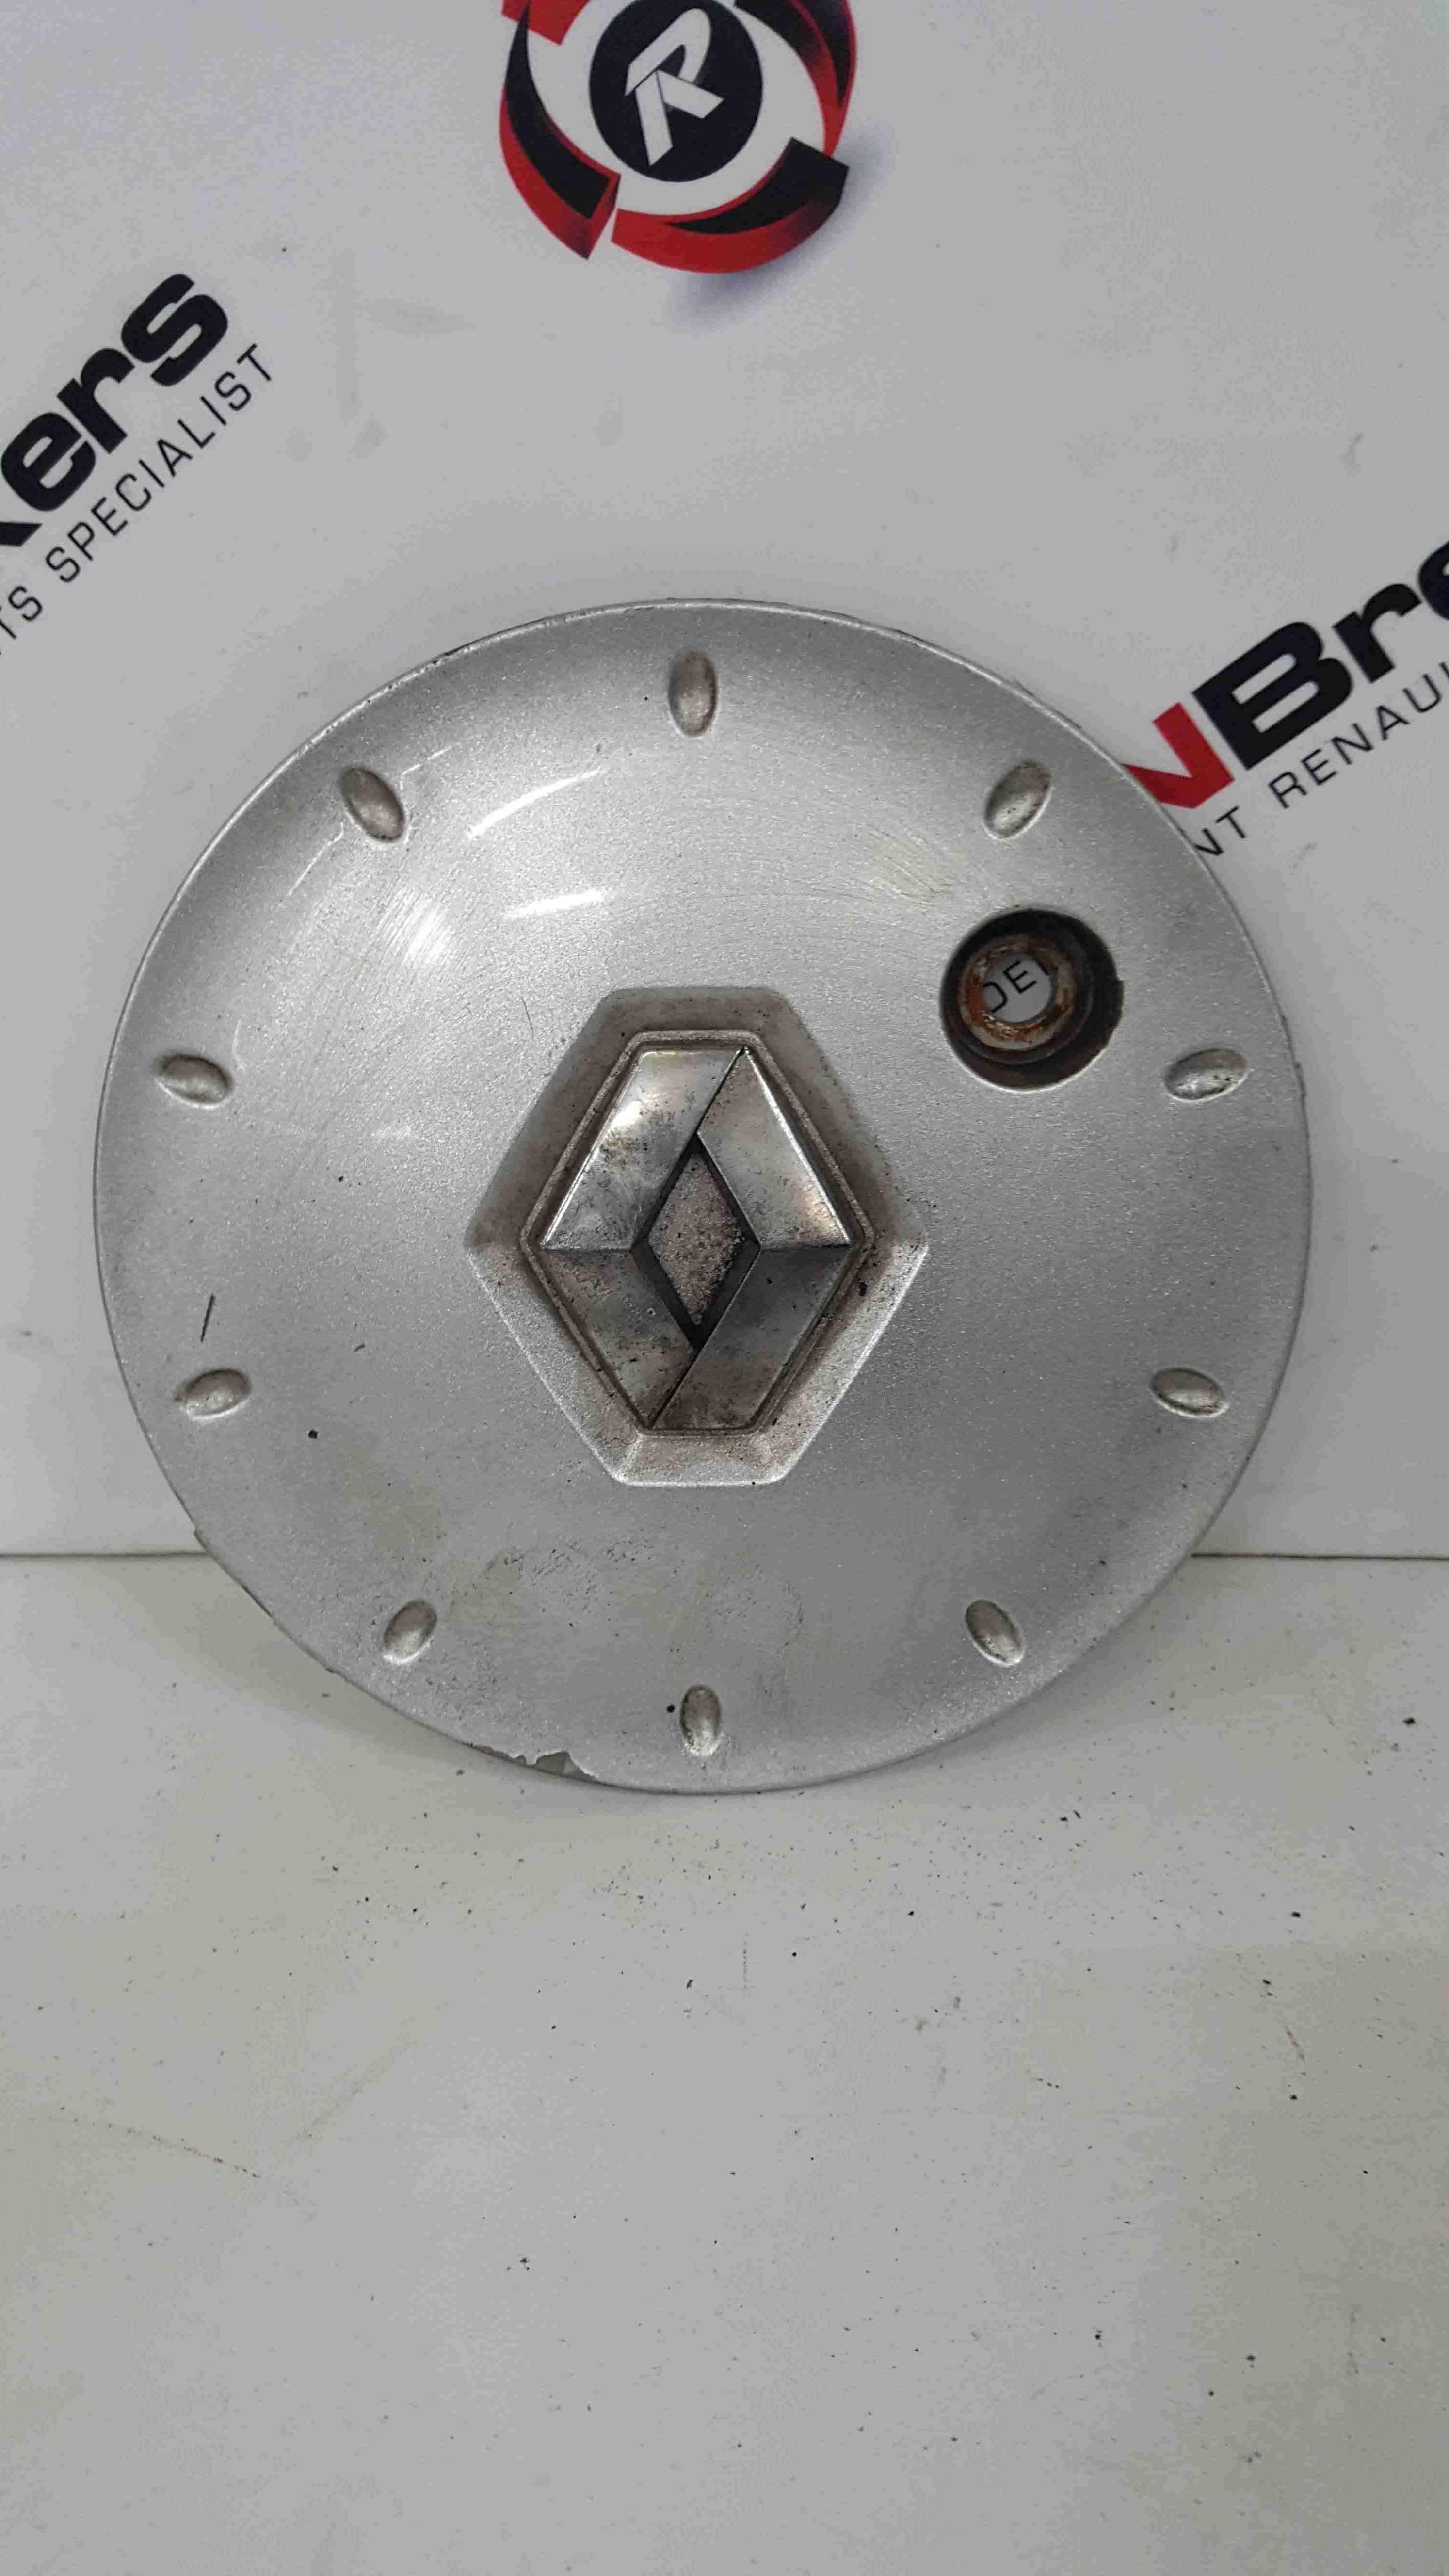 Renault Megane 2002-2008 Curacoa Alloy Wheel Centre Cap X1 8200425813